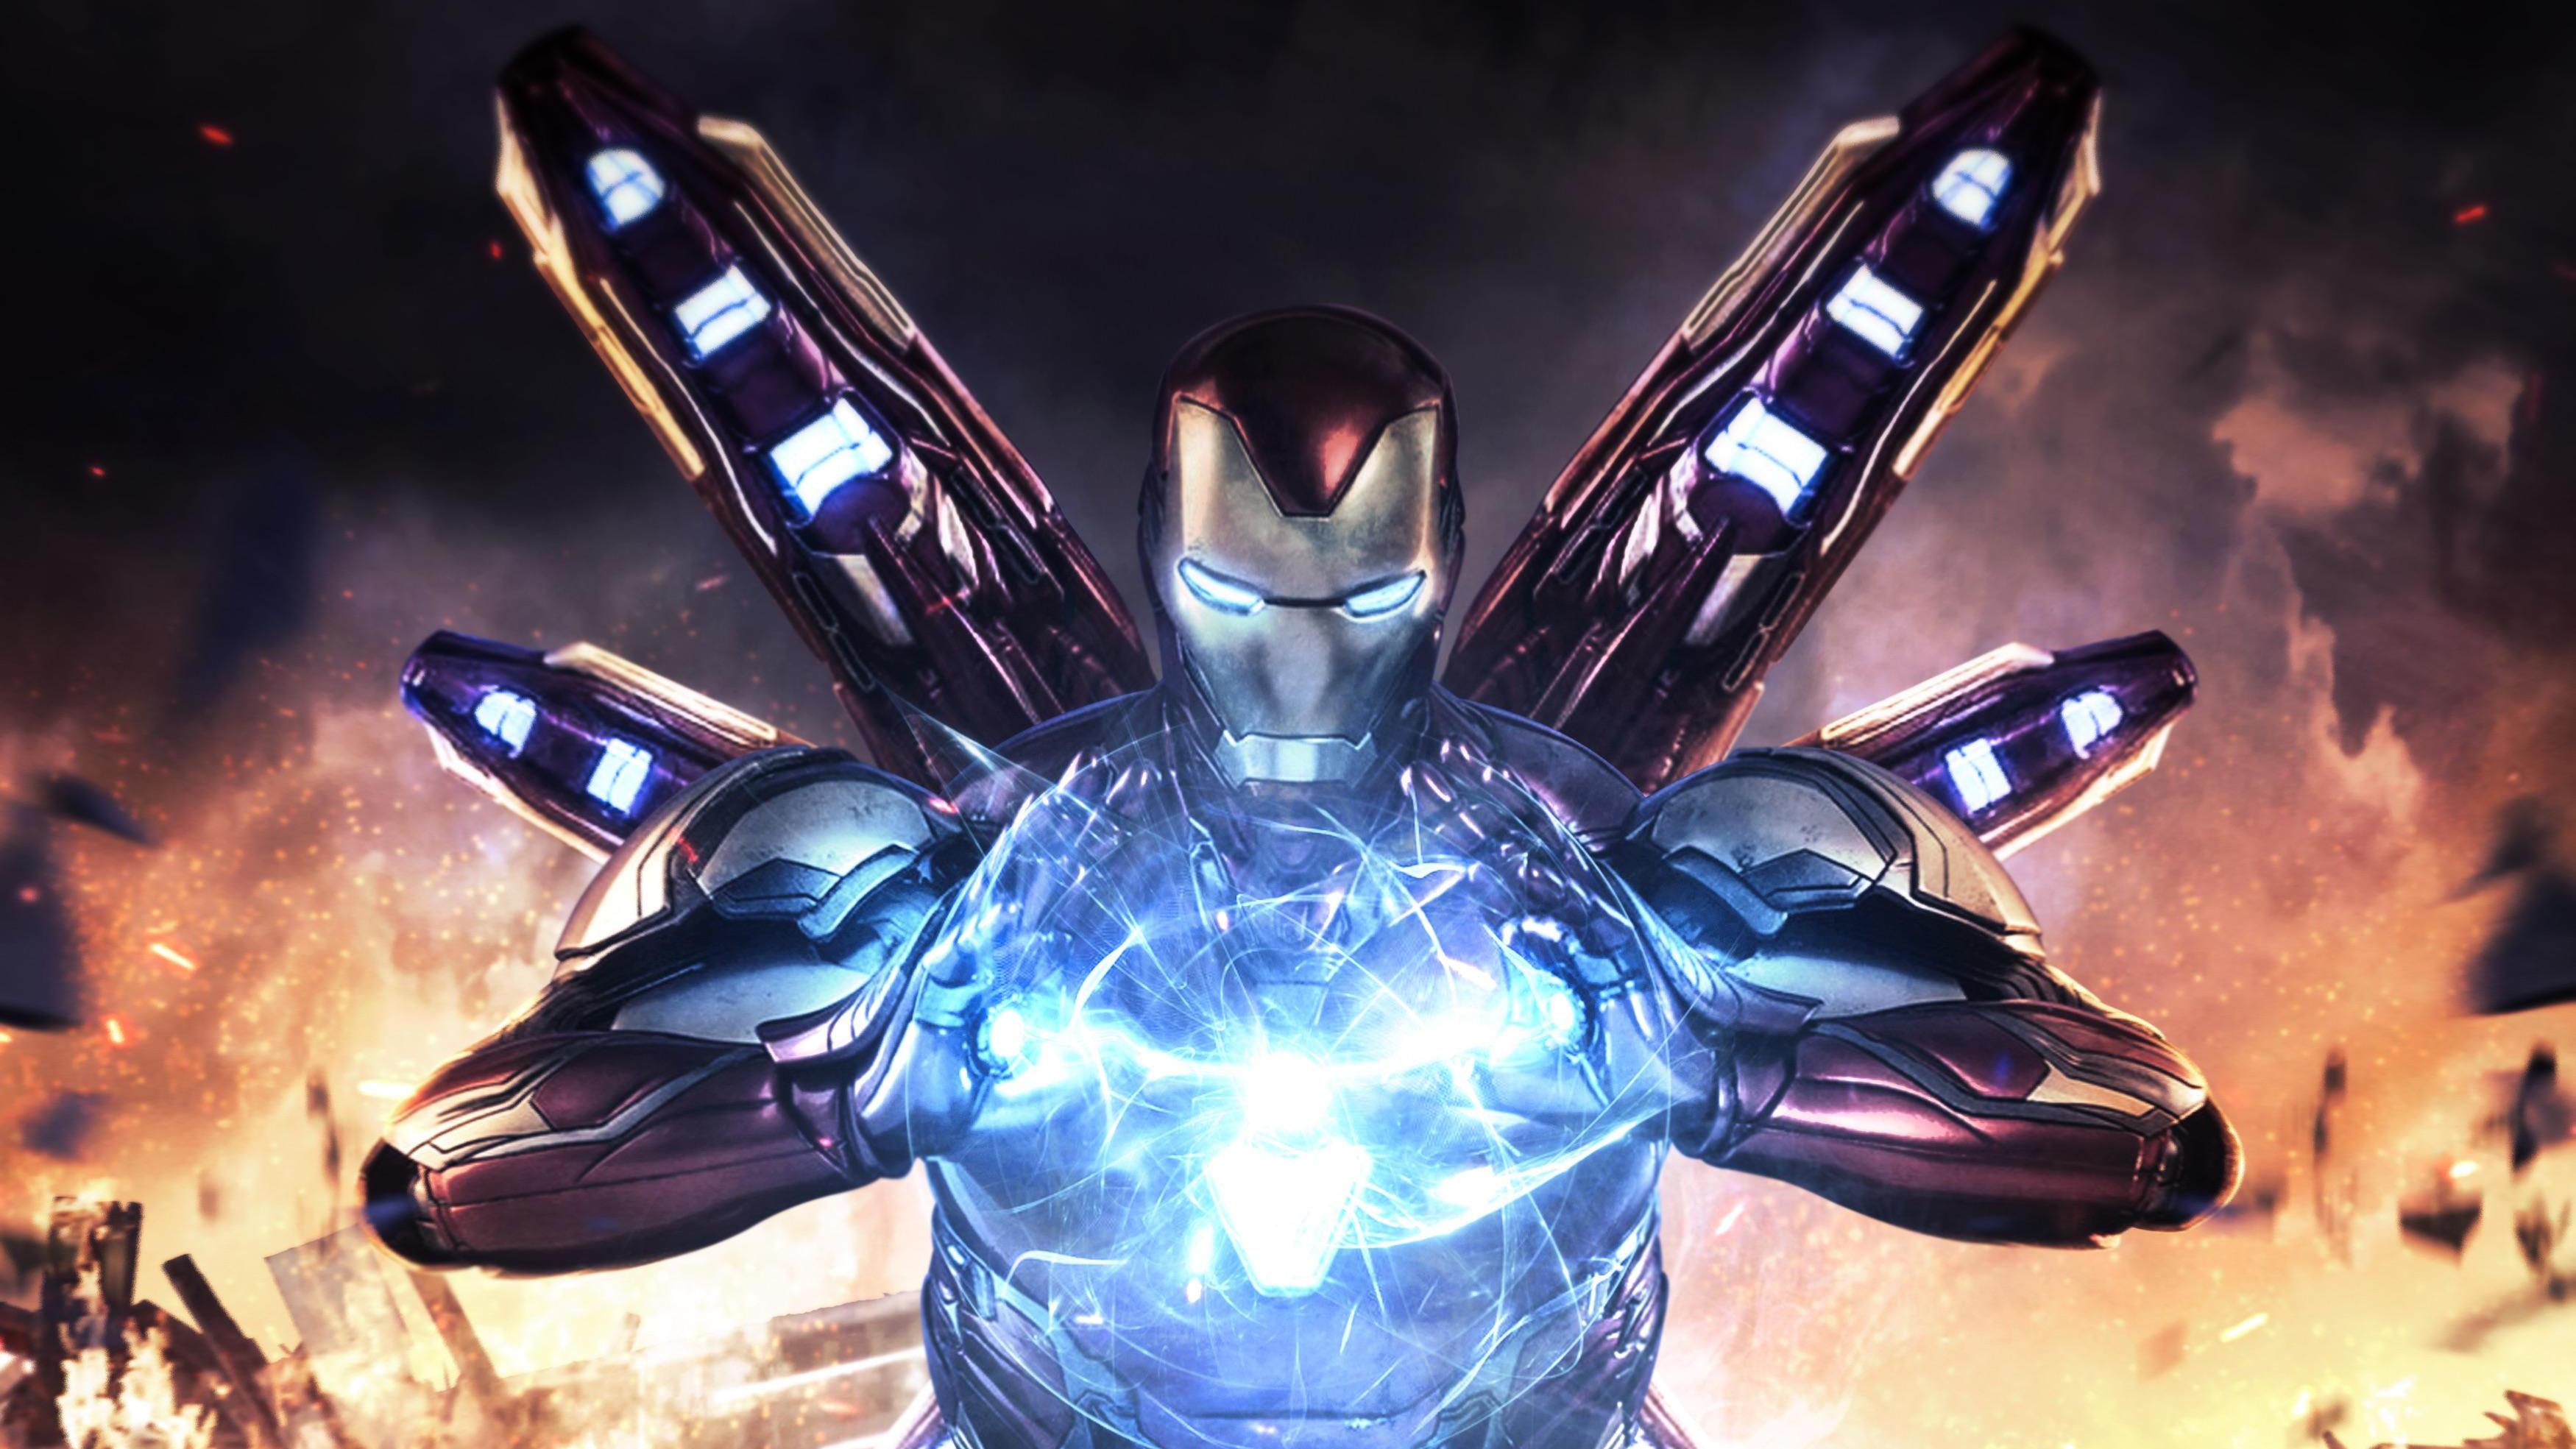 Iron Man Avengers Endgame 4k Hd Superheroes 4k Wallpapers